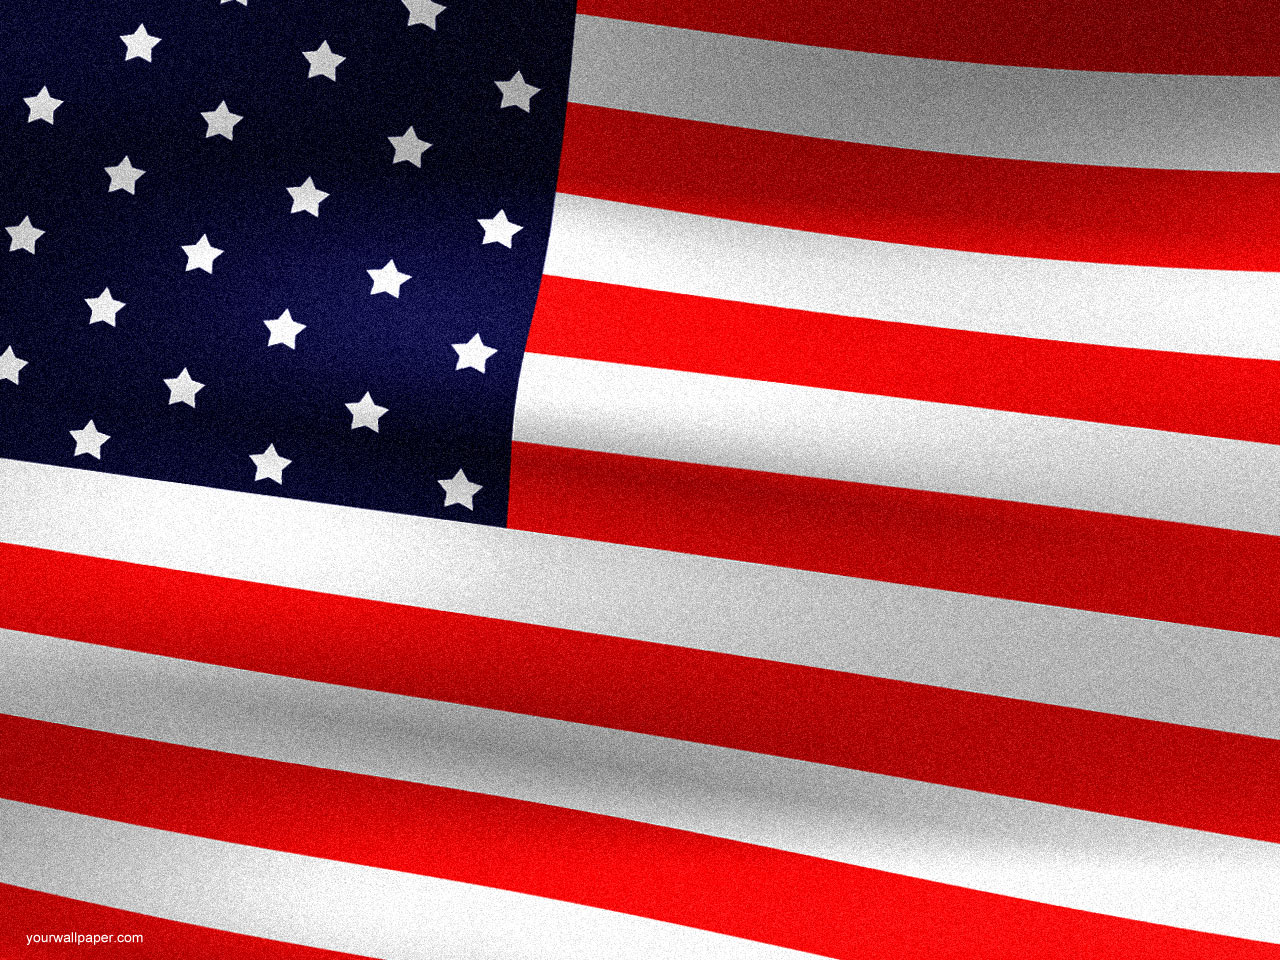 US Flag Wallpaper 1280x960